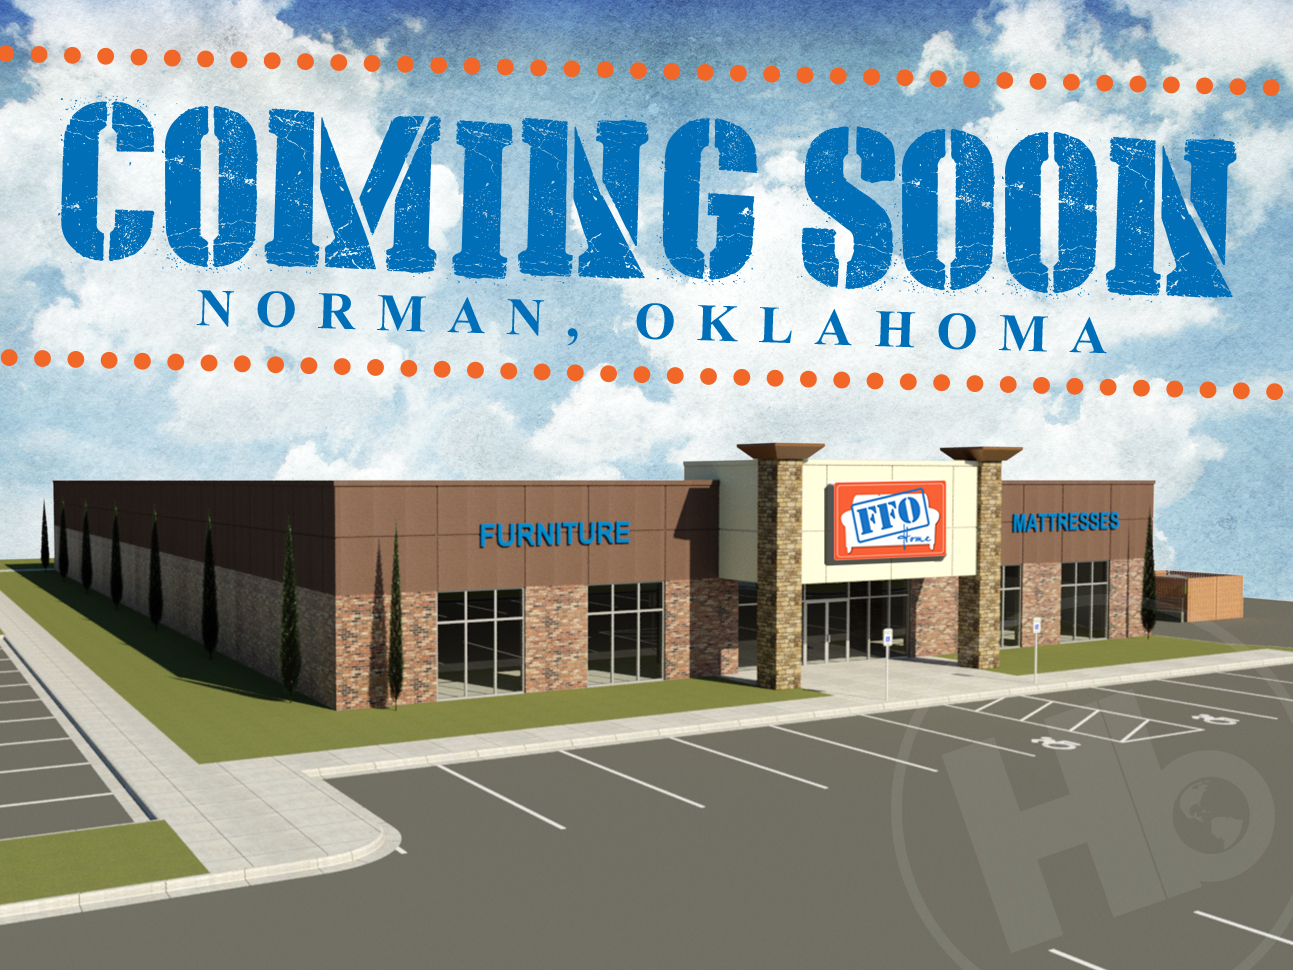 FFO Home Coming to Norman, Oklahoma